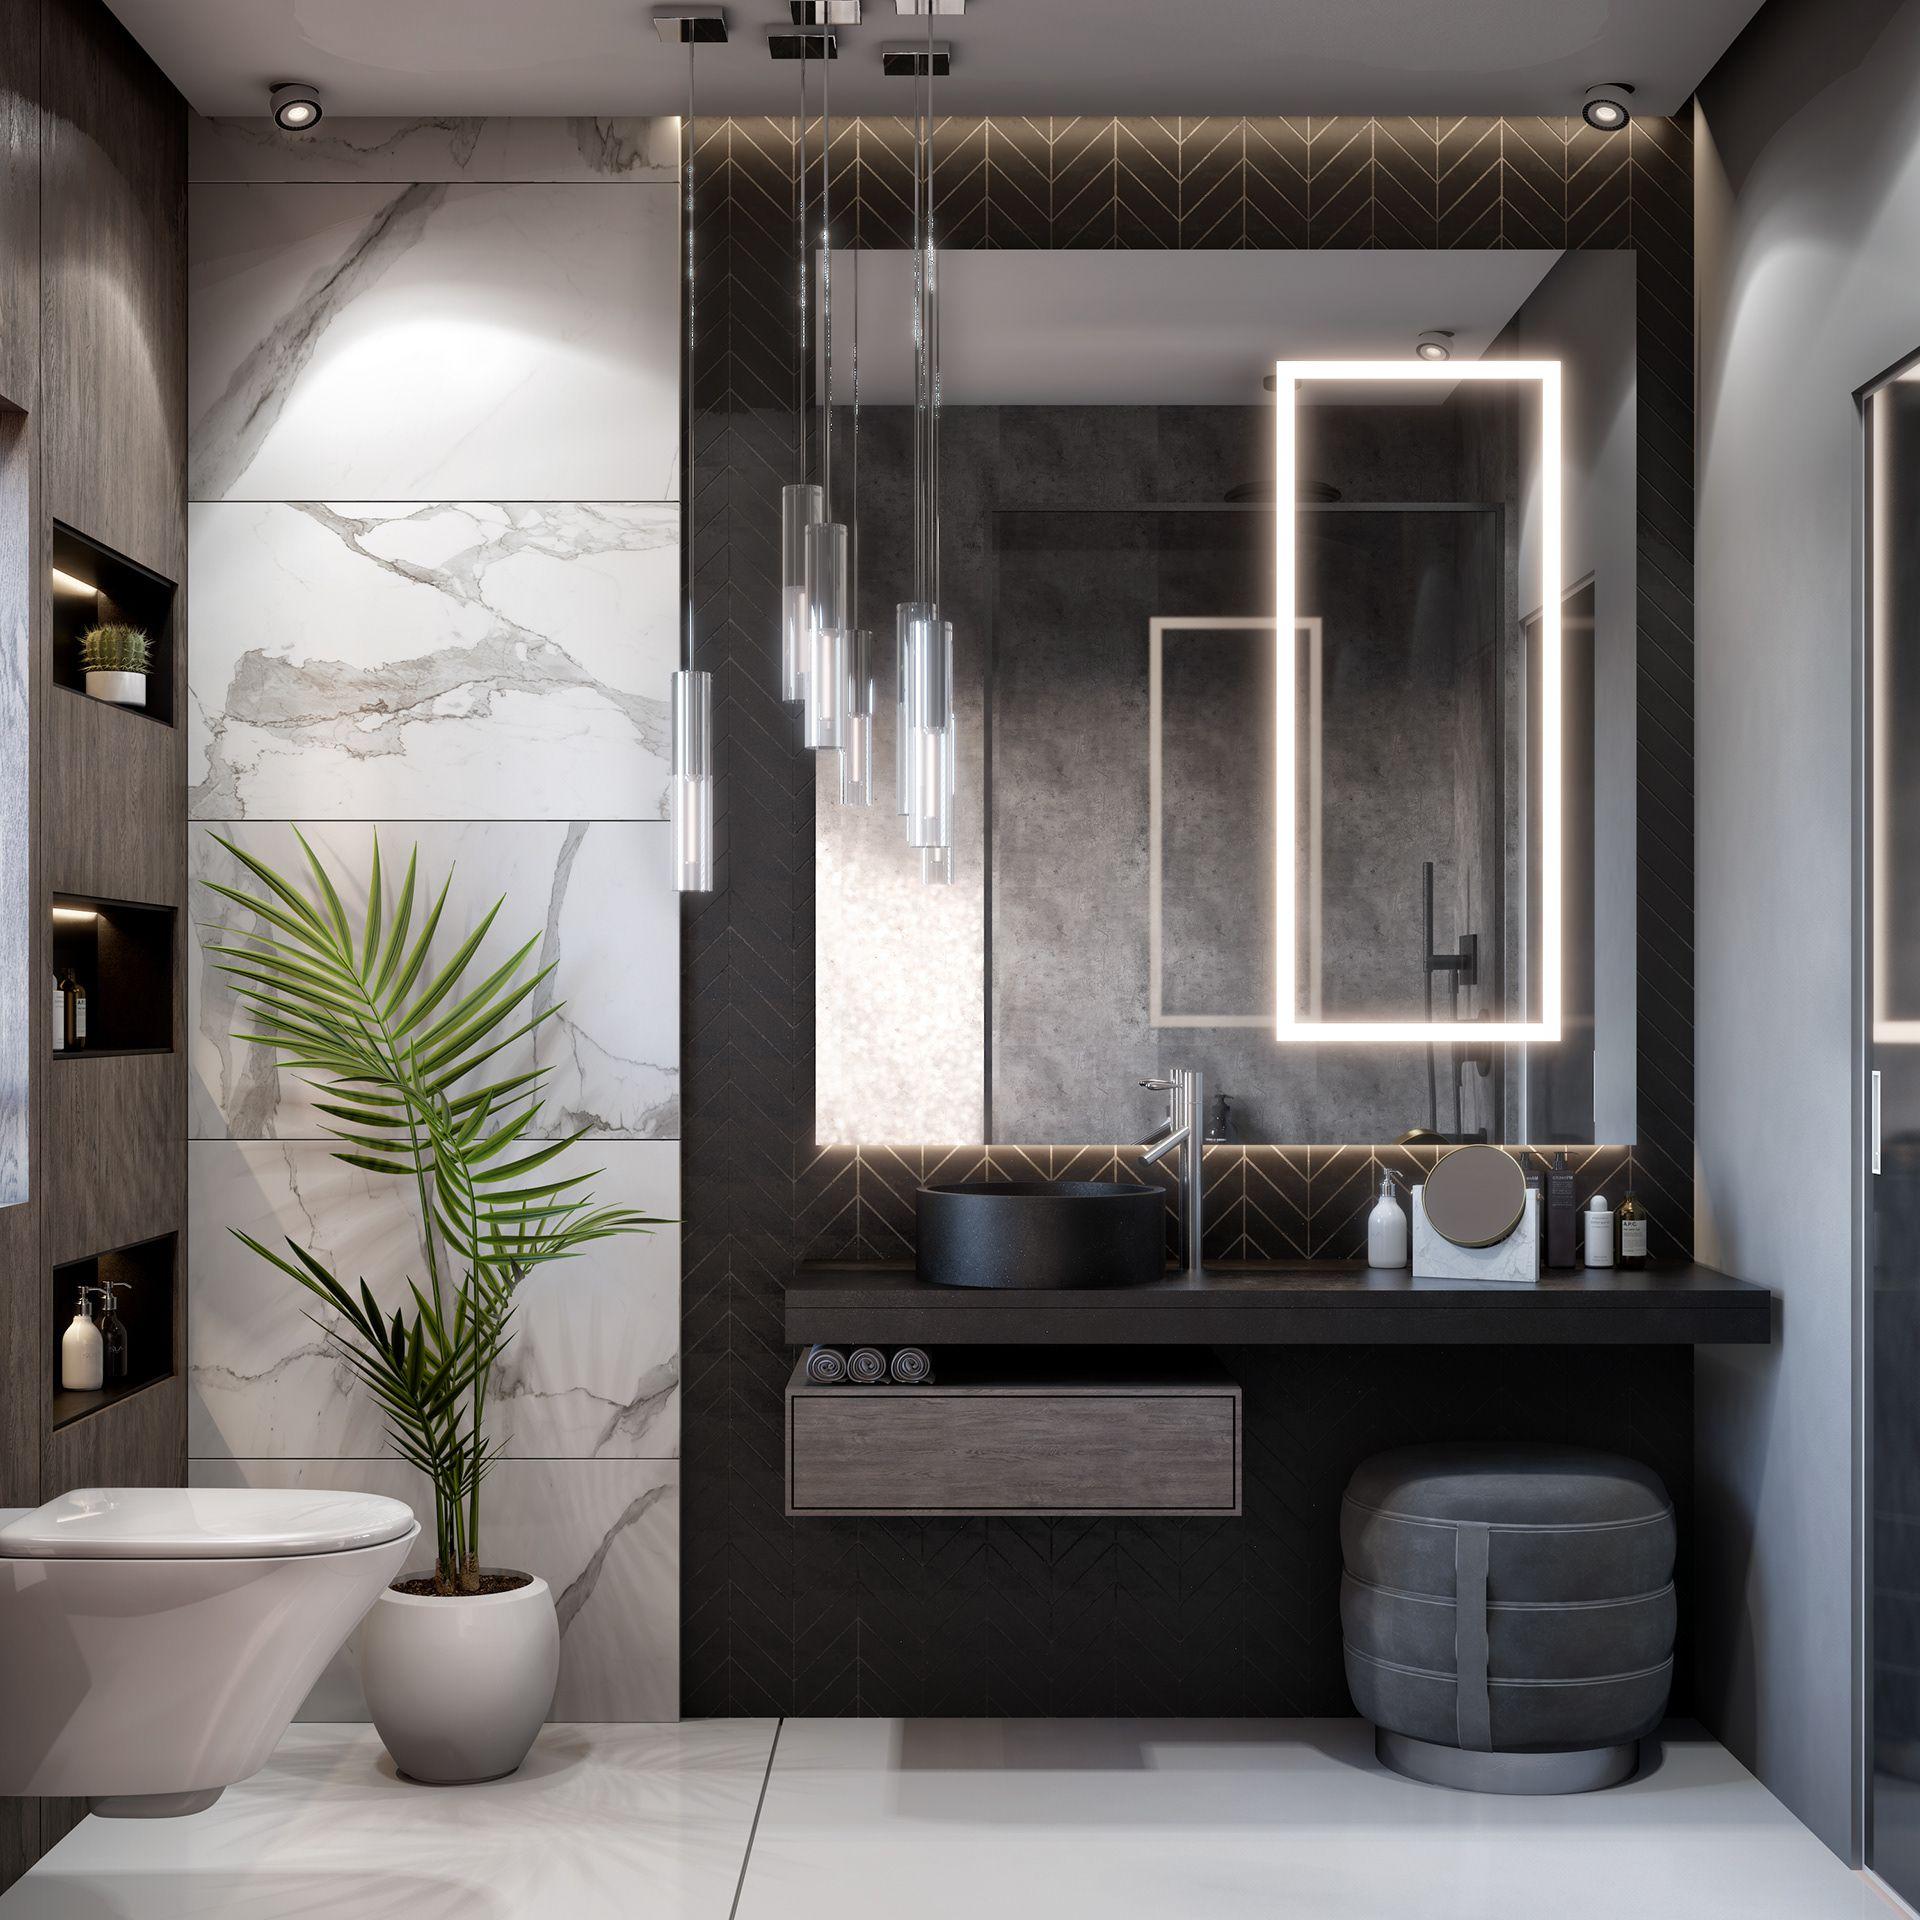 Modern bathroom Kuwait city on Behance  Modern bathroom, Top